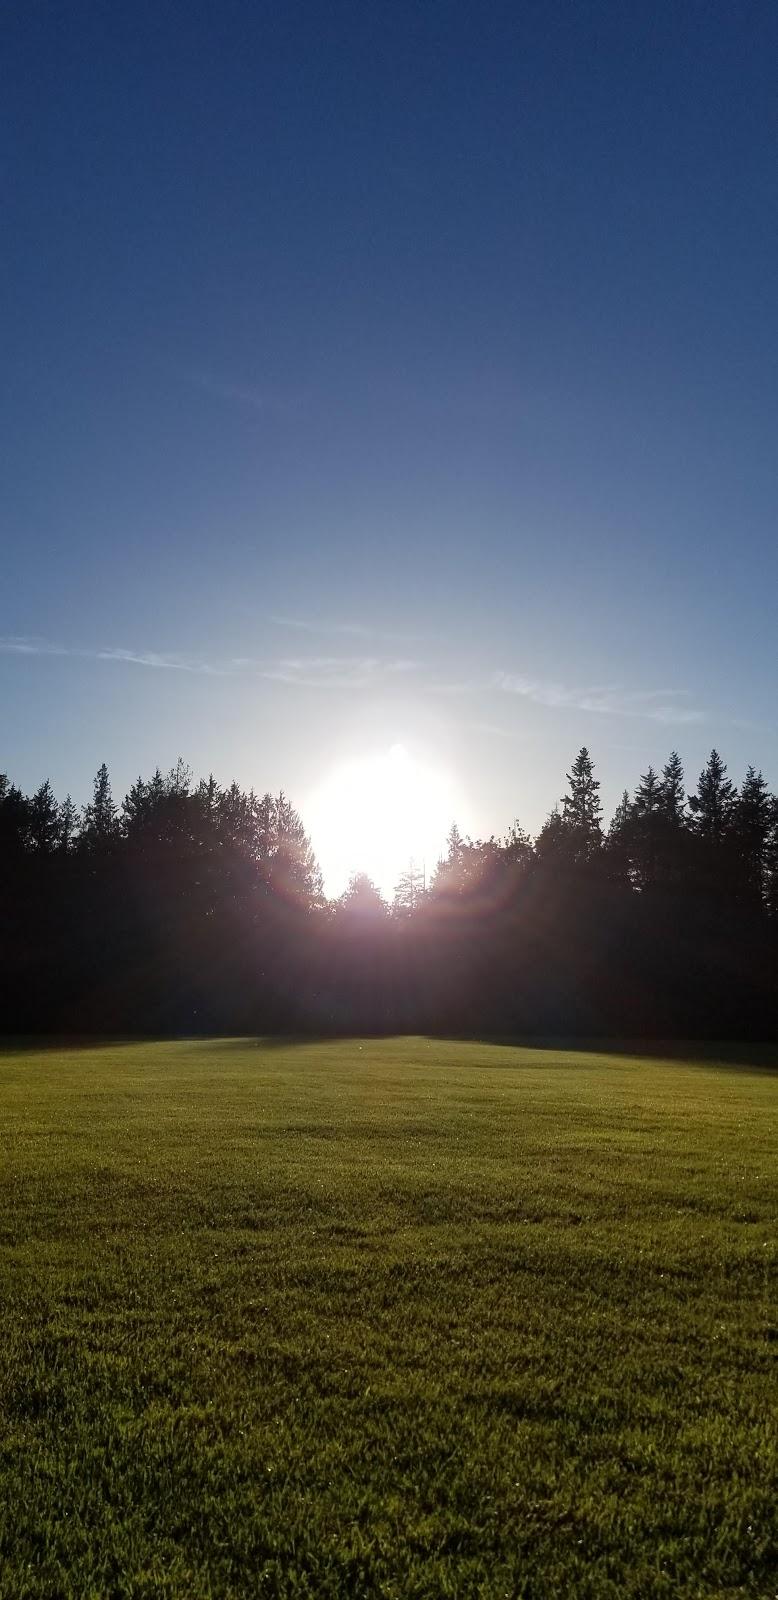 Crescent Park - Sports Field | park | 2585 132 St, Surrey, BC V4P 1X4, Canada | 6045015050 OR +1 604-501-5050